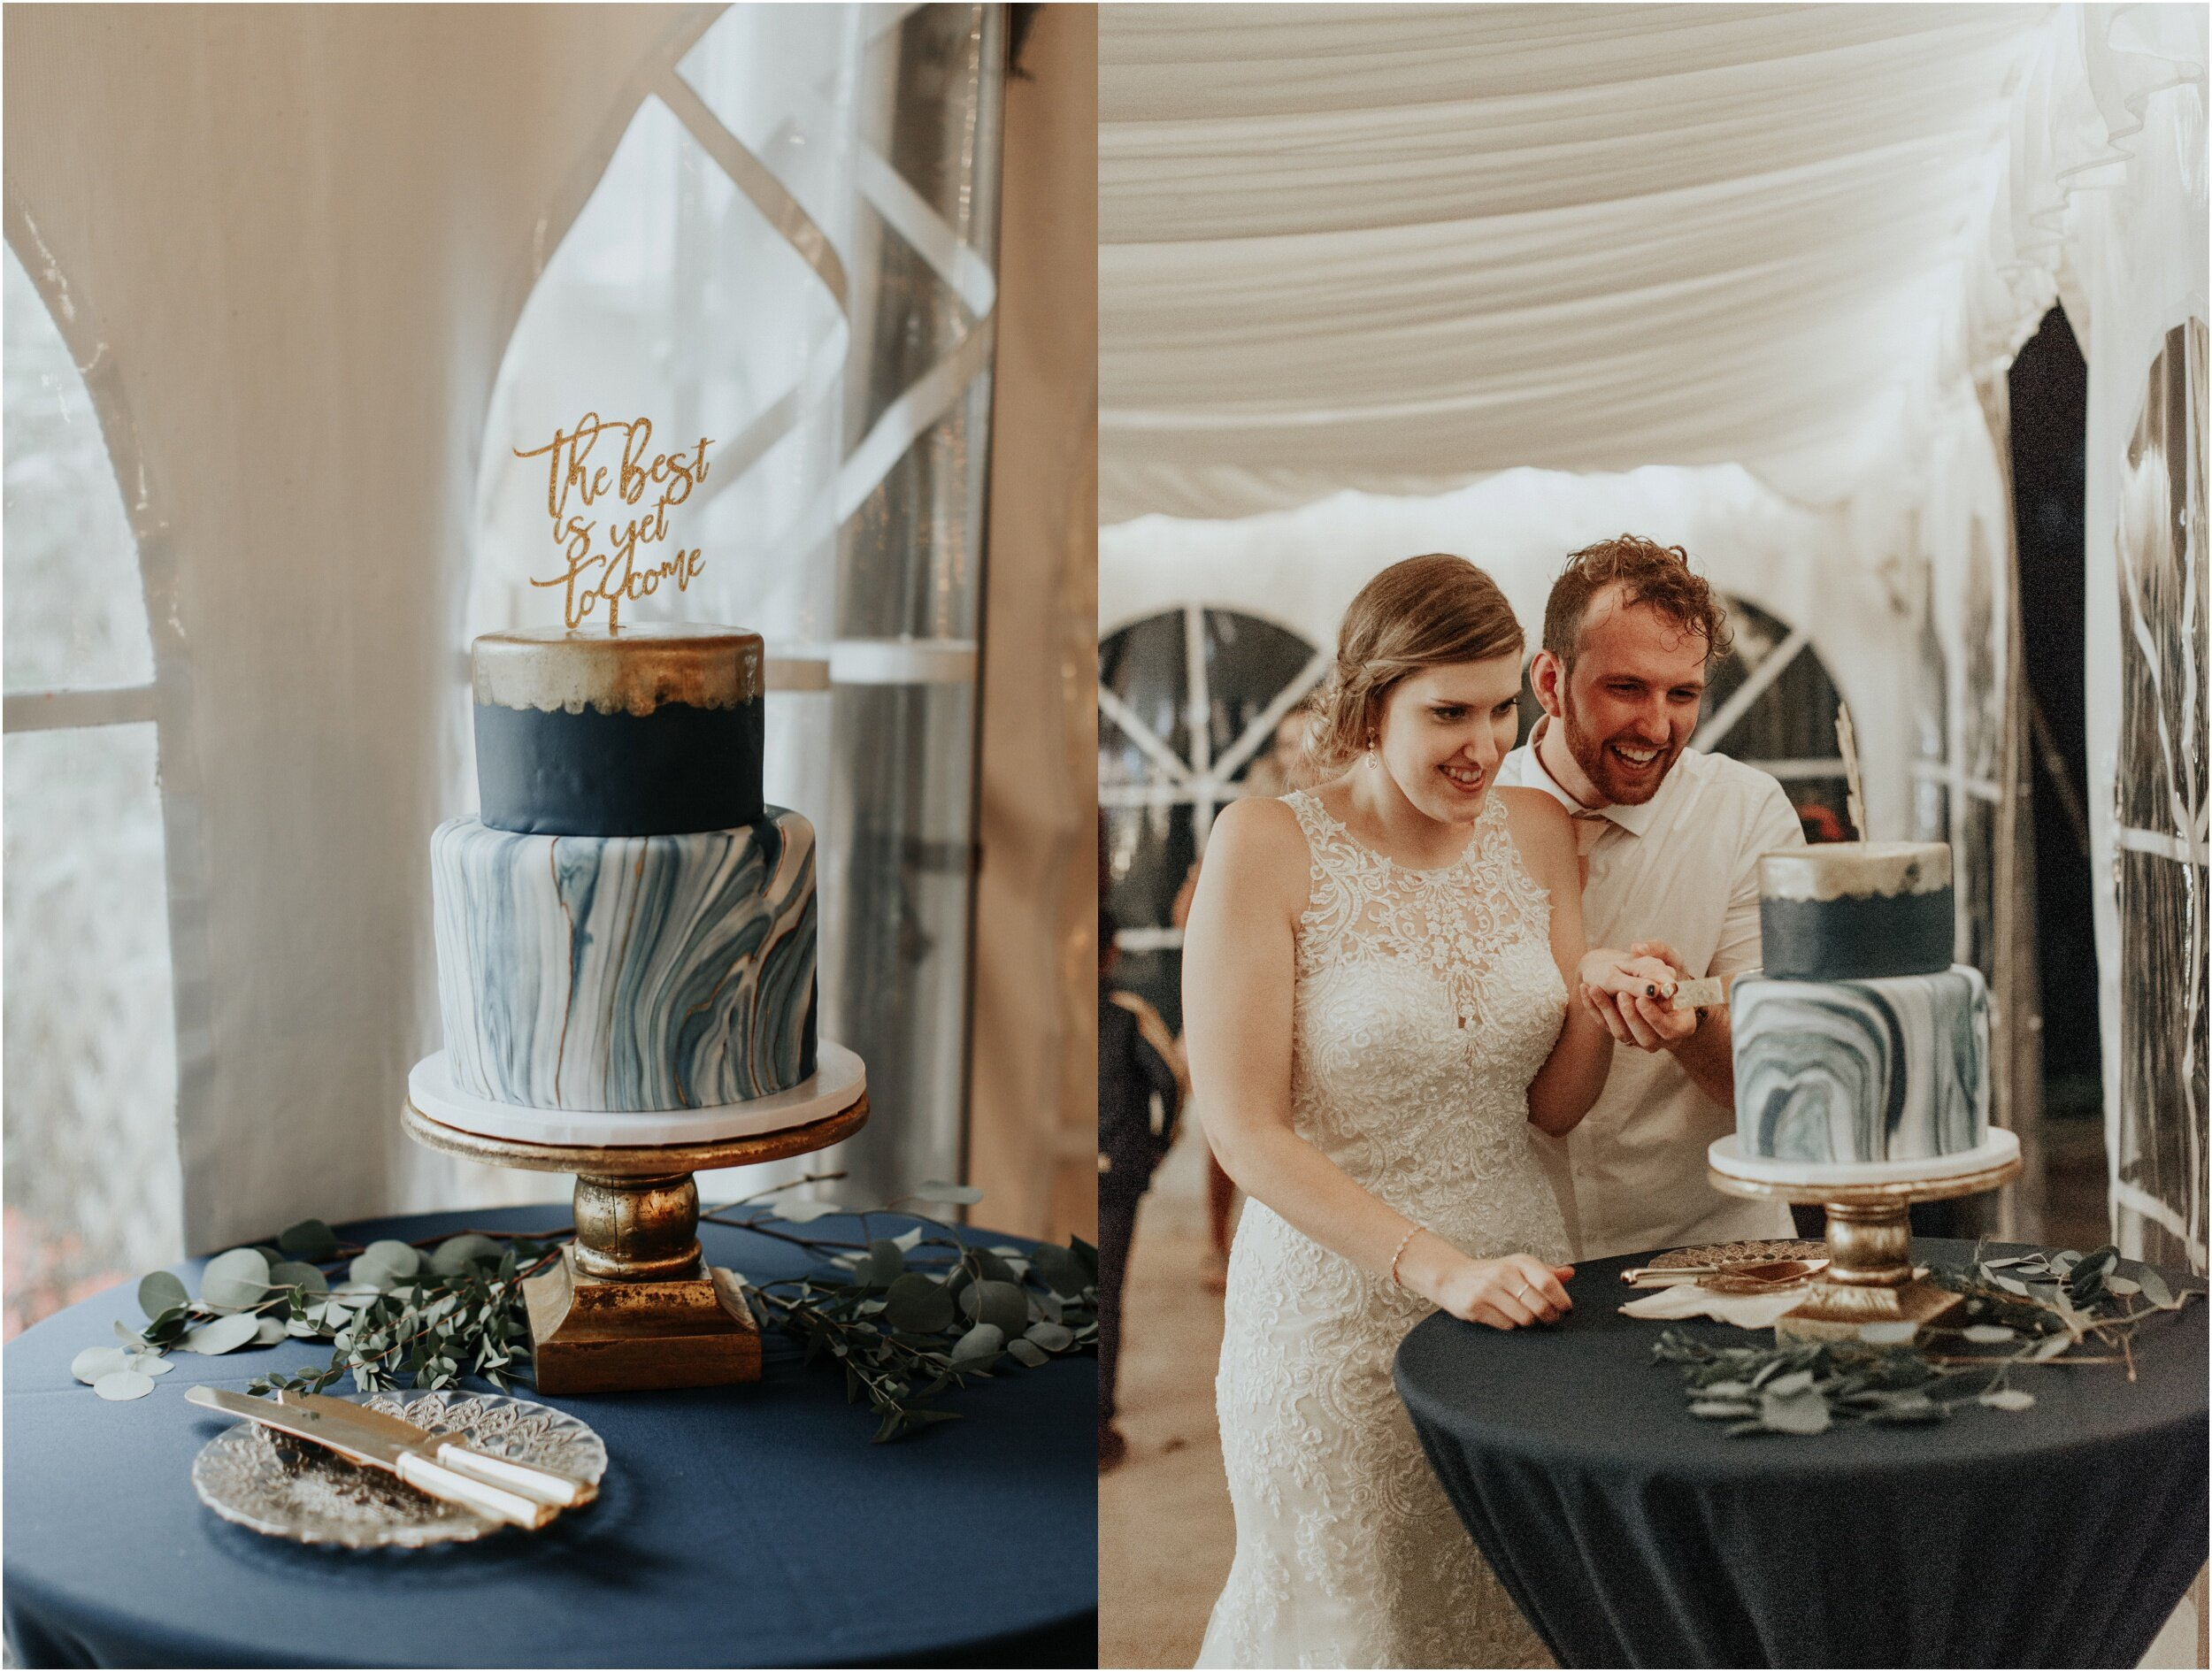 steph-and-jordan-cox-our-wedding-historic-shady-lane-compass-wedding-collective-hazel-lining-photography-destination-elopement-wedding-engagement-photography_0095.jpg